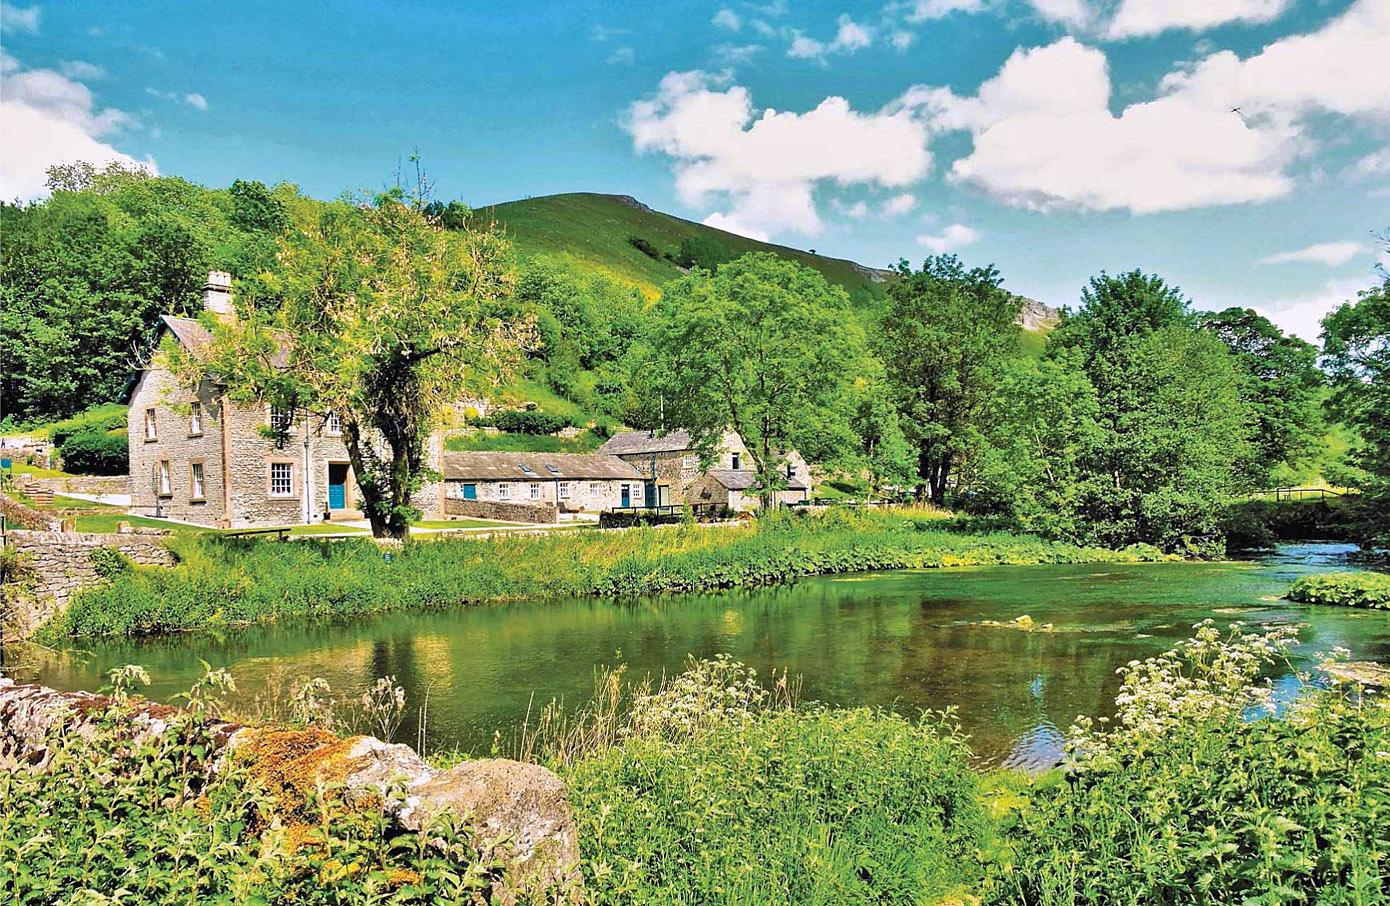 Upperdale on the River Wye, Derbyshire by David Sellman.jpg